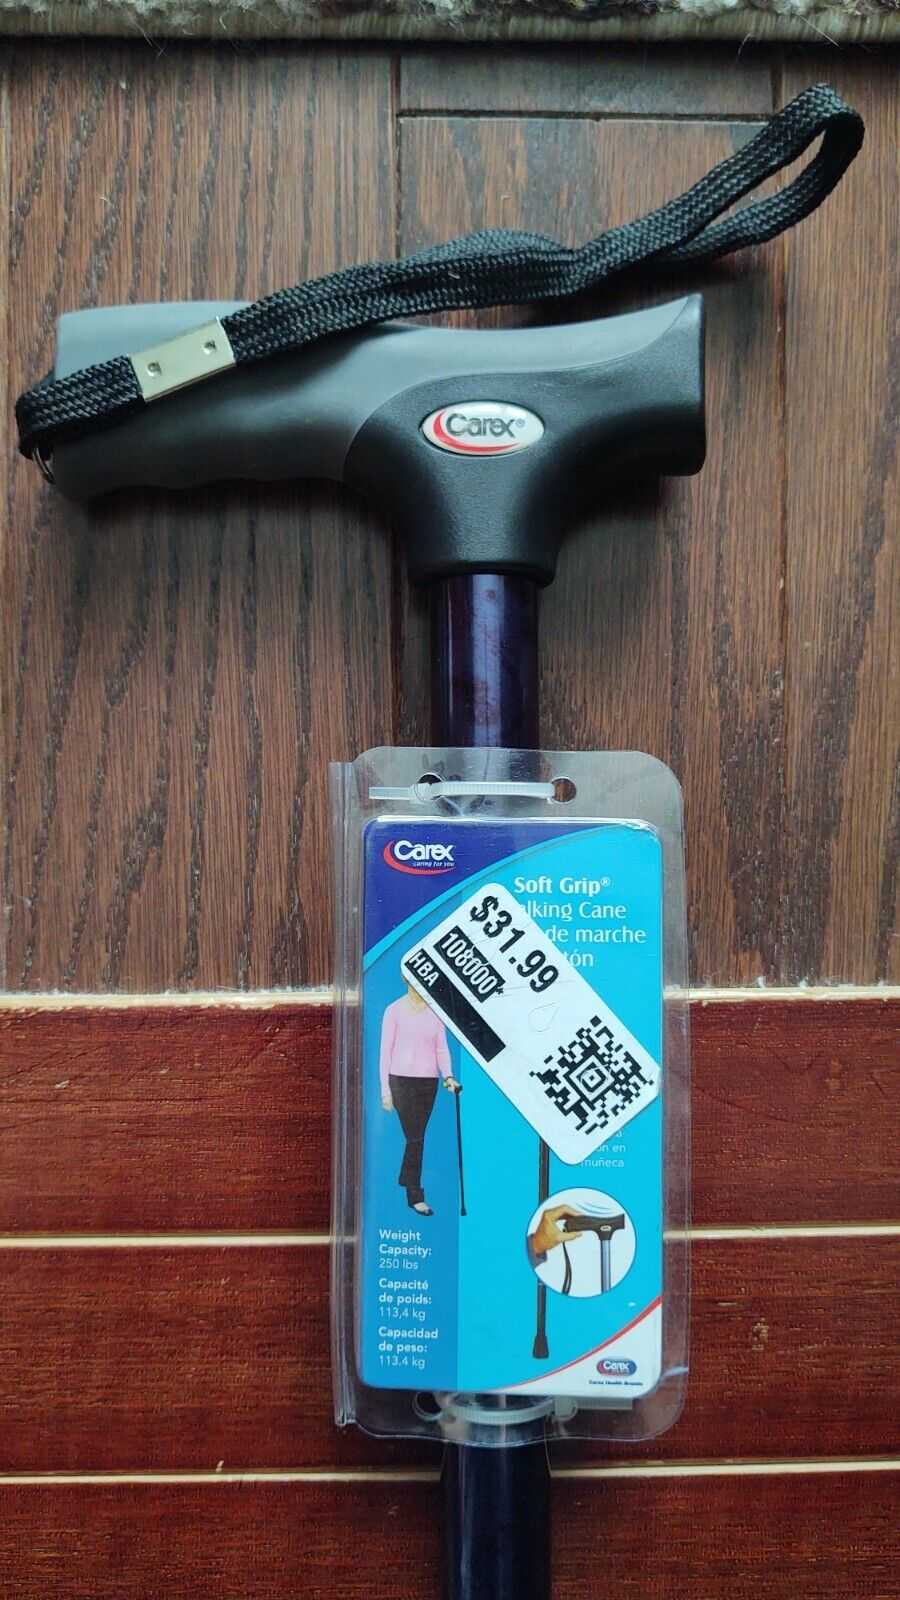 Carex Health Brands Soft Grip Derby Cane, Designer Blue